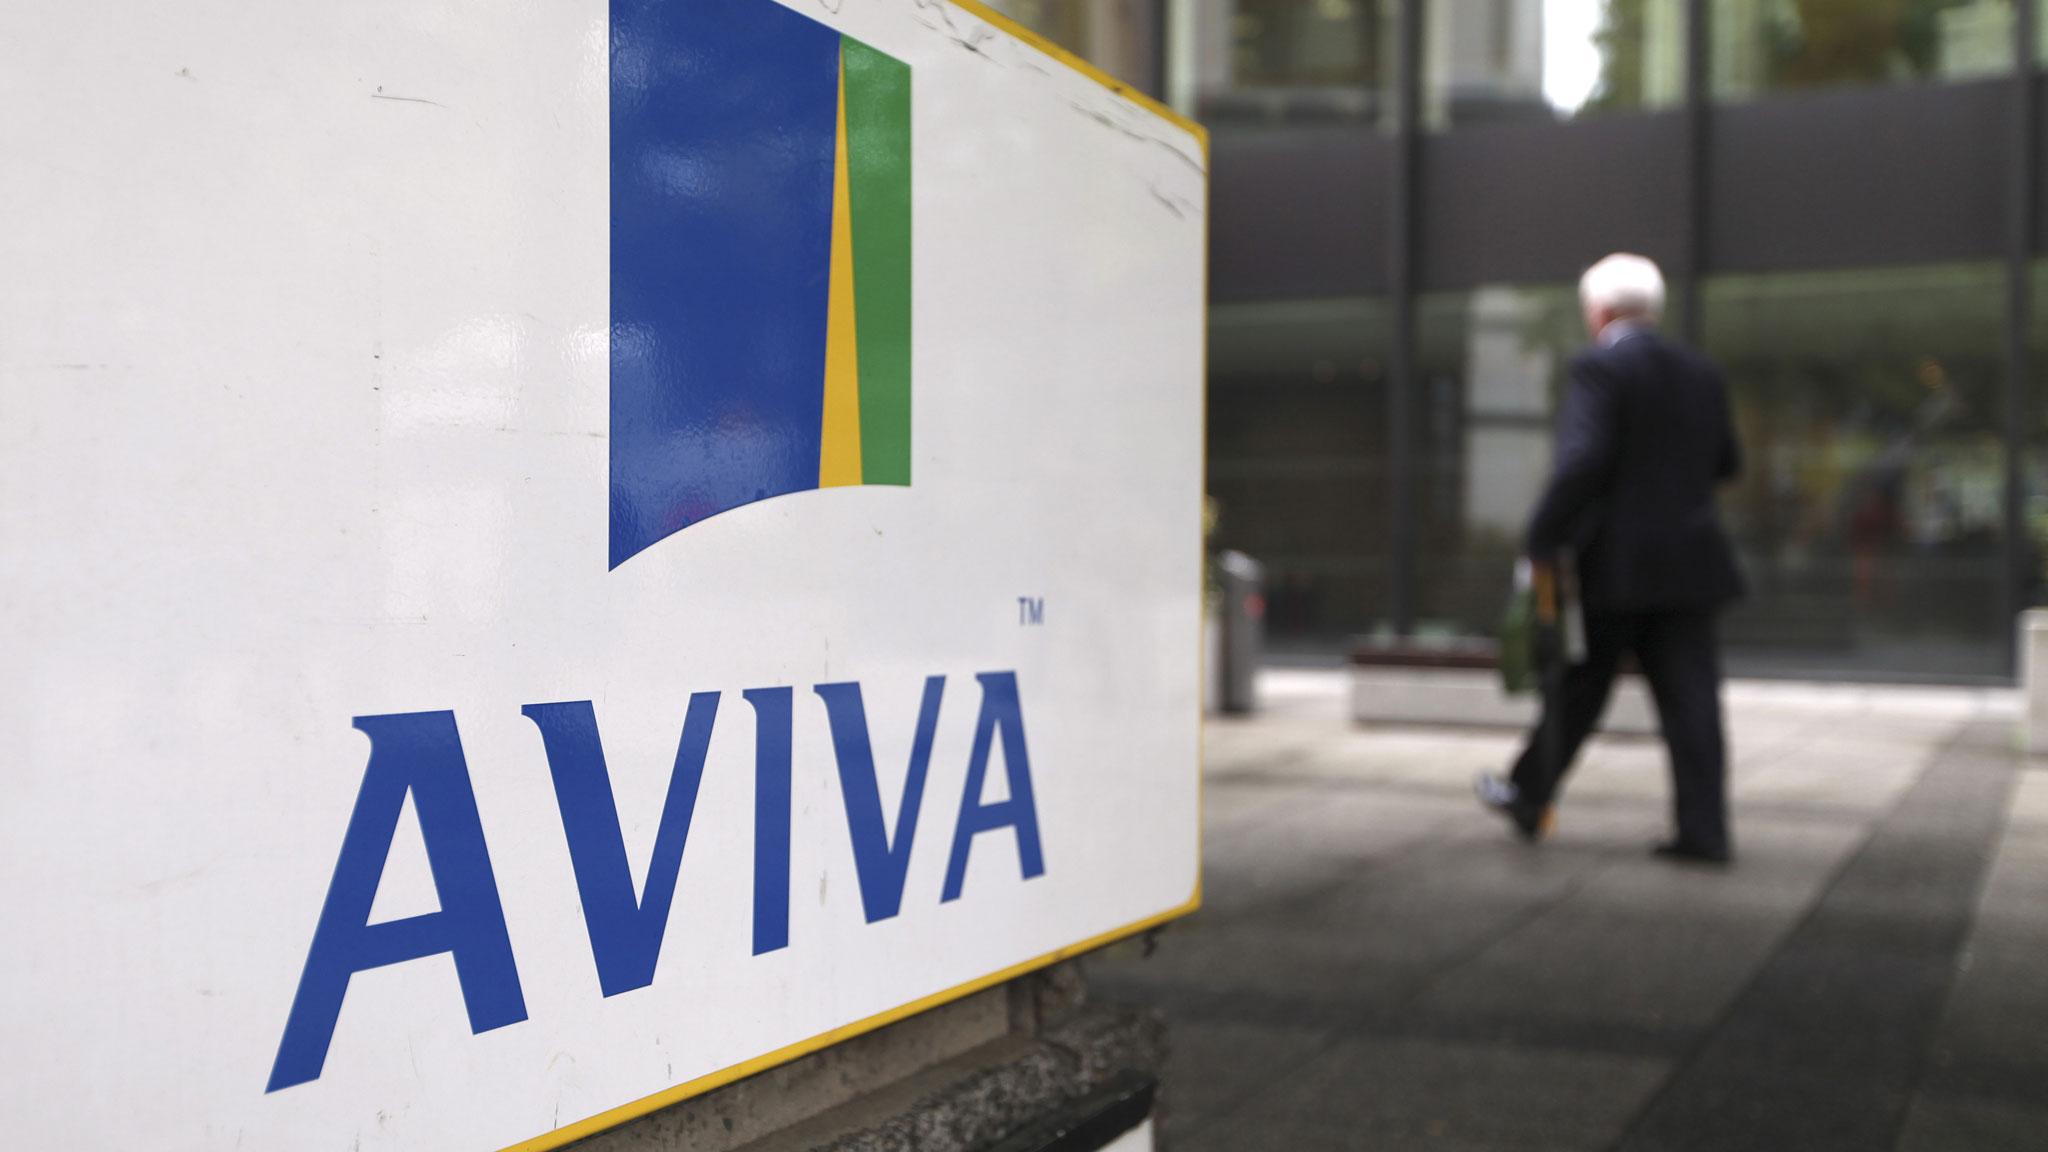 Aviva Opens Digital Garage In Technology Push Financial Times